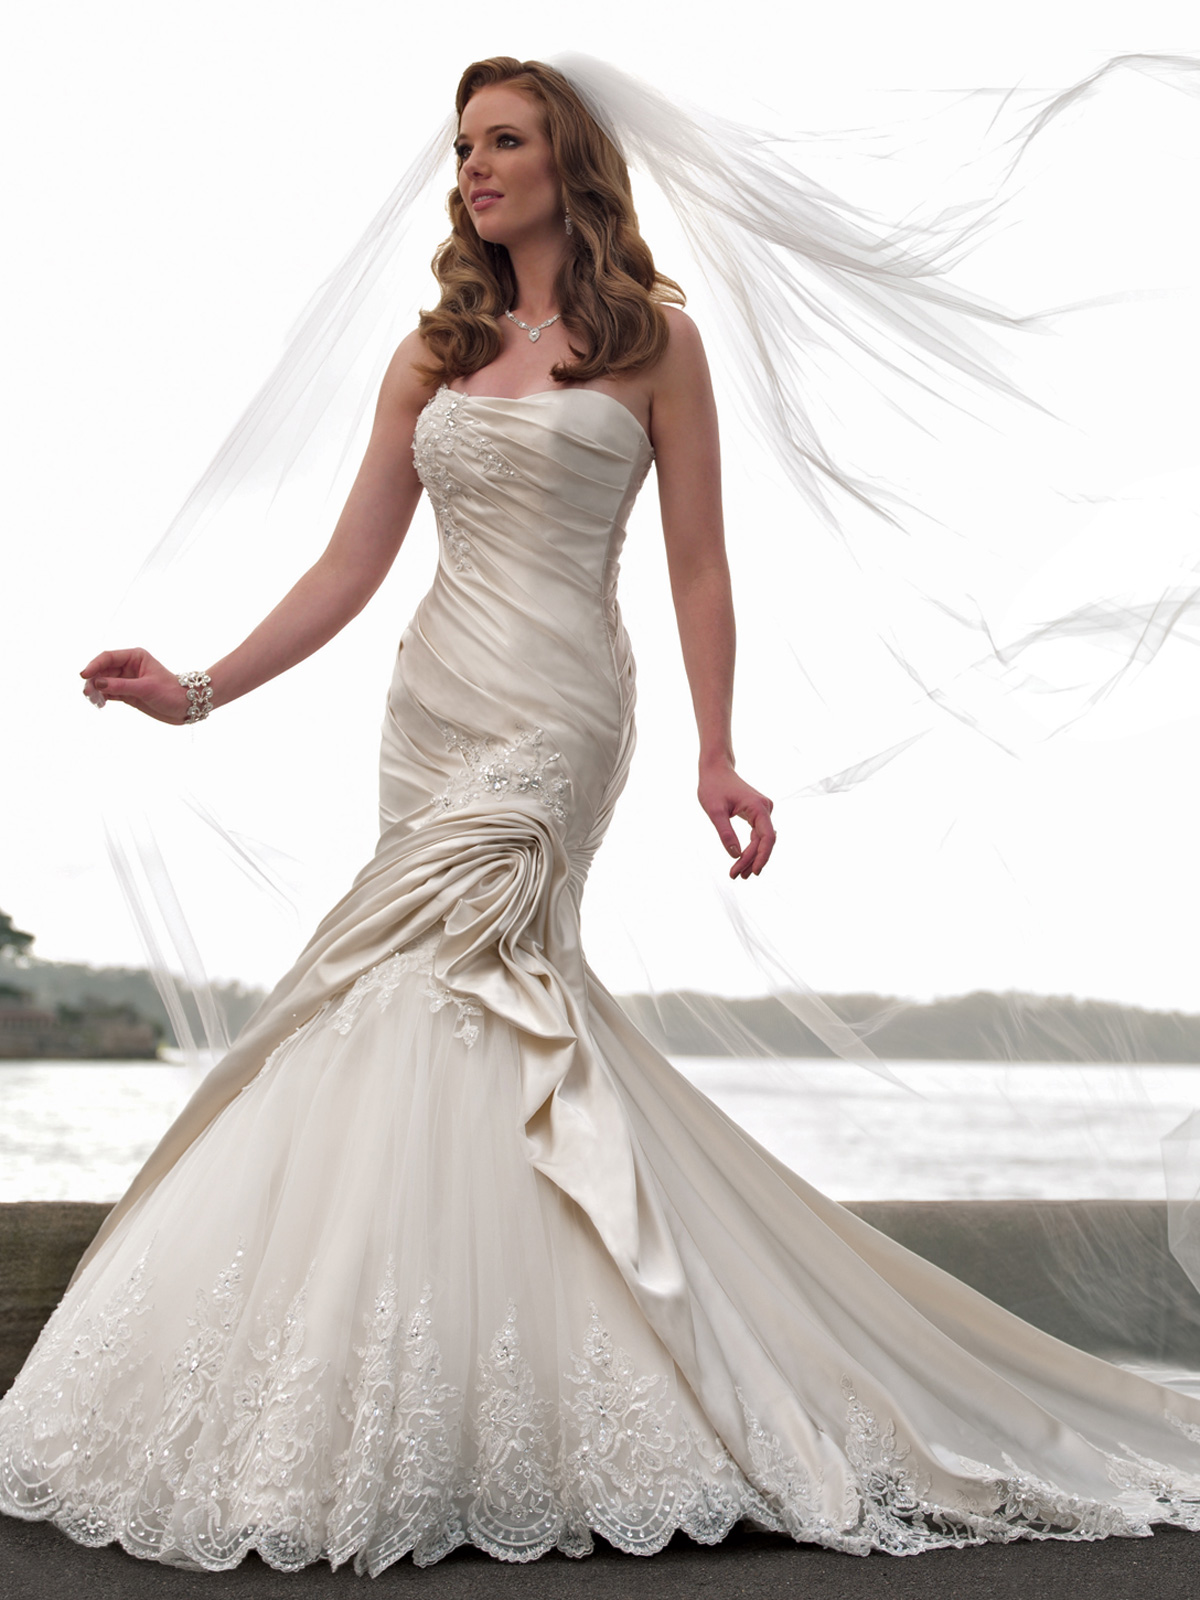 AA strapless mermaid wedding dresses strapless mermaid wedding dress with lace